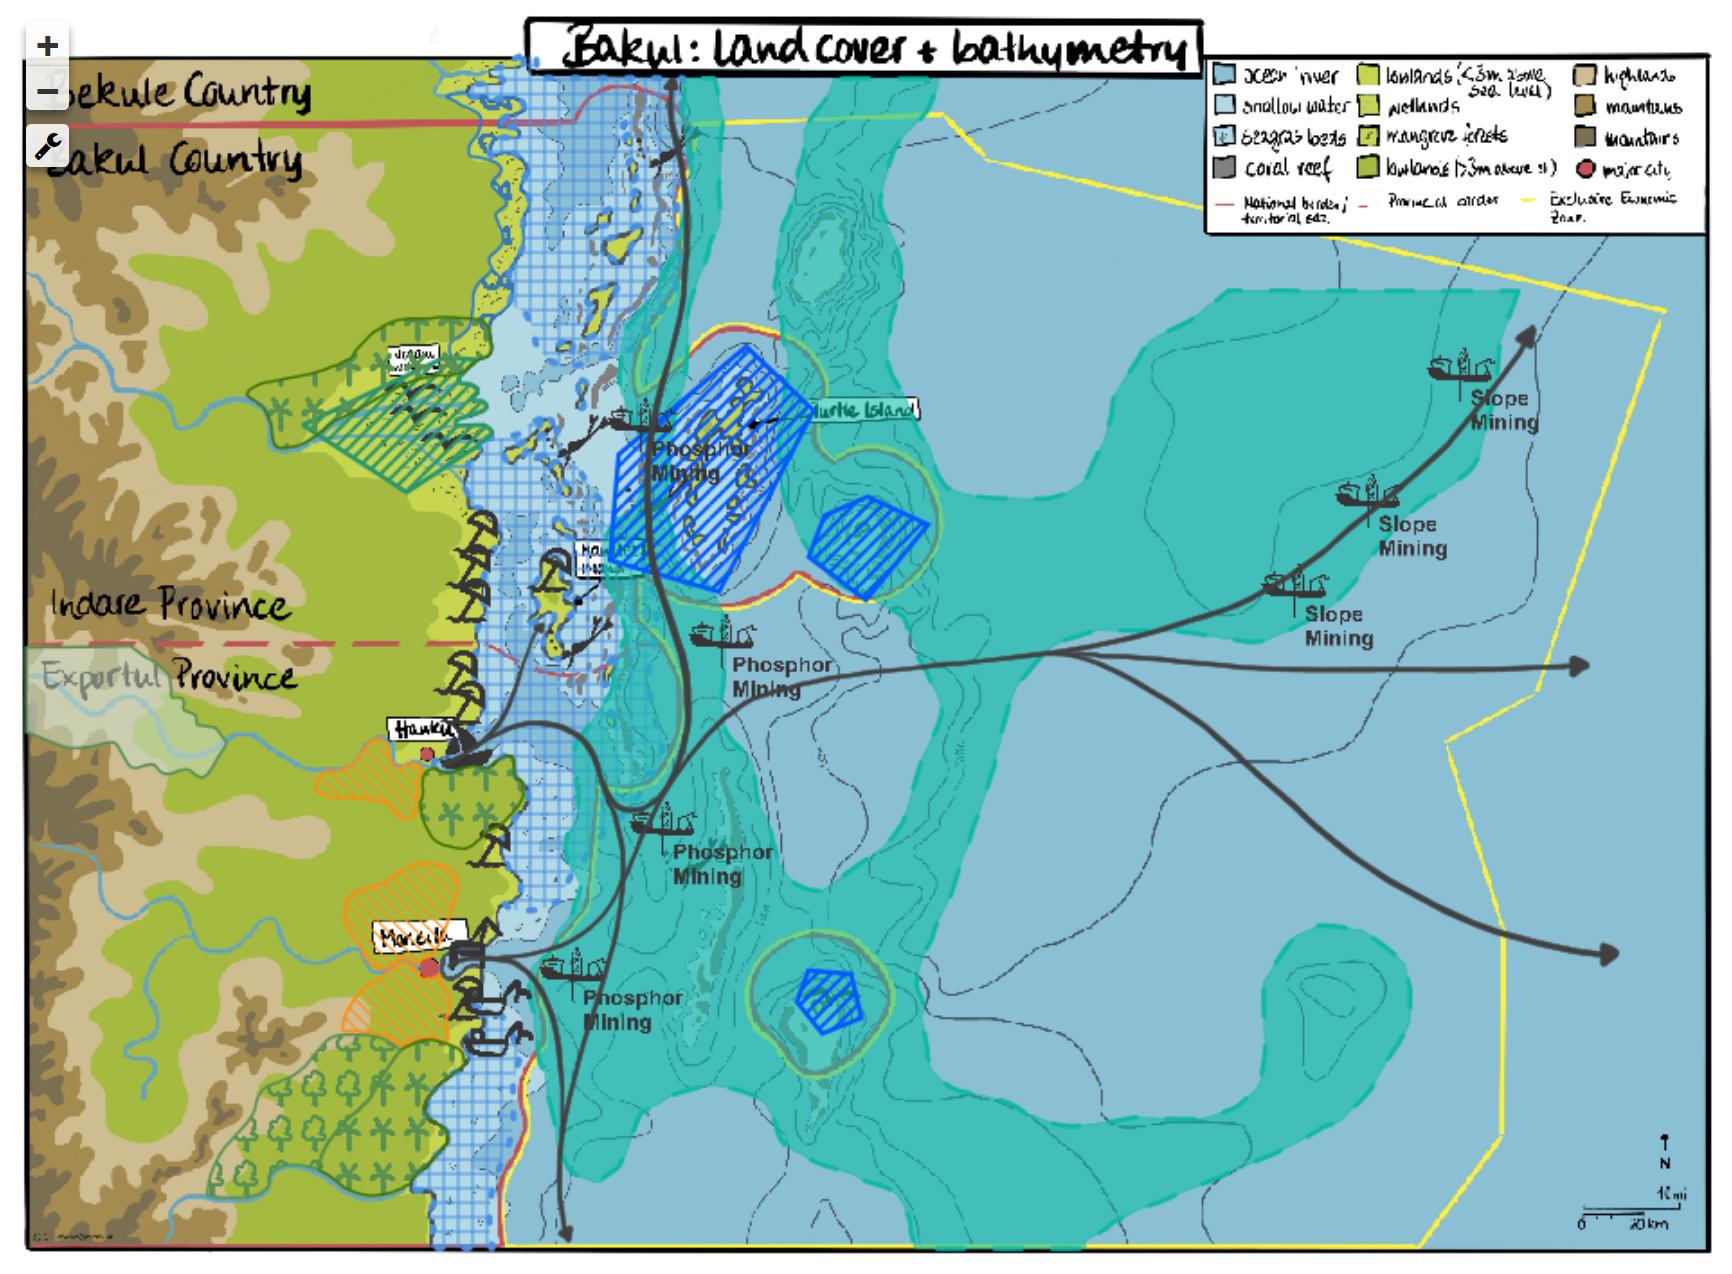 Marine Spatial Planning software SeaSketch showcasing Bakul